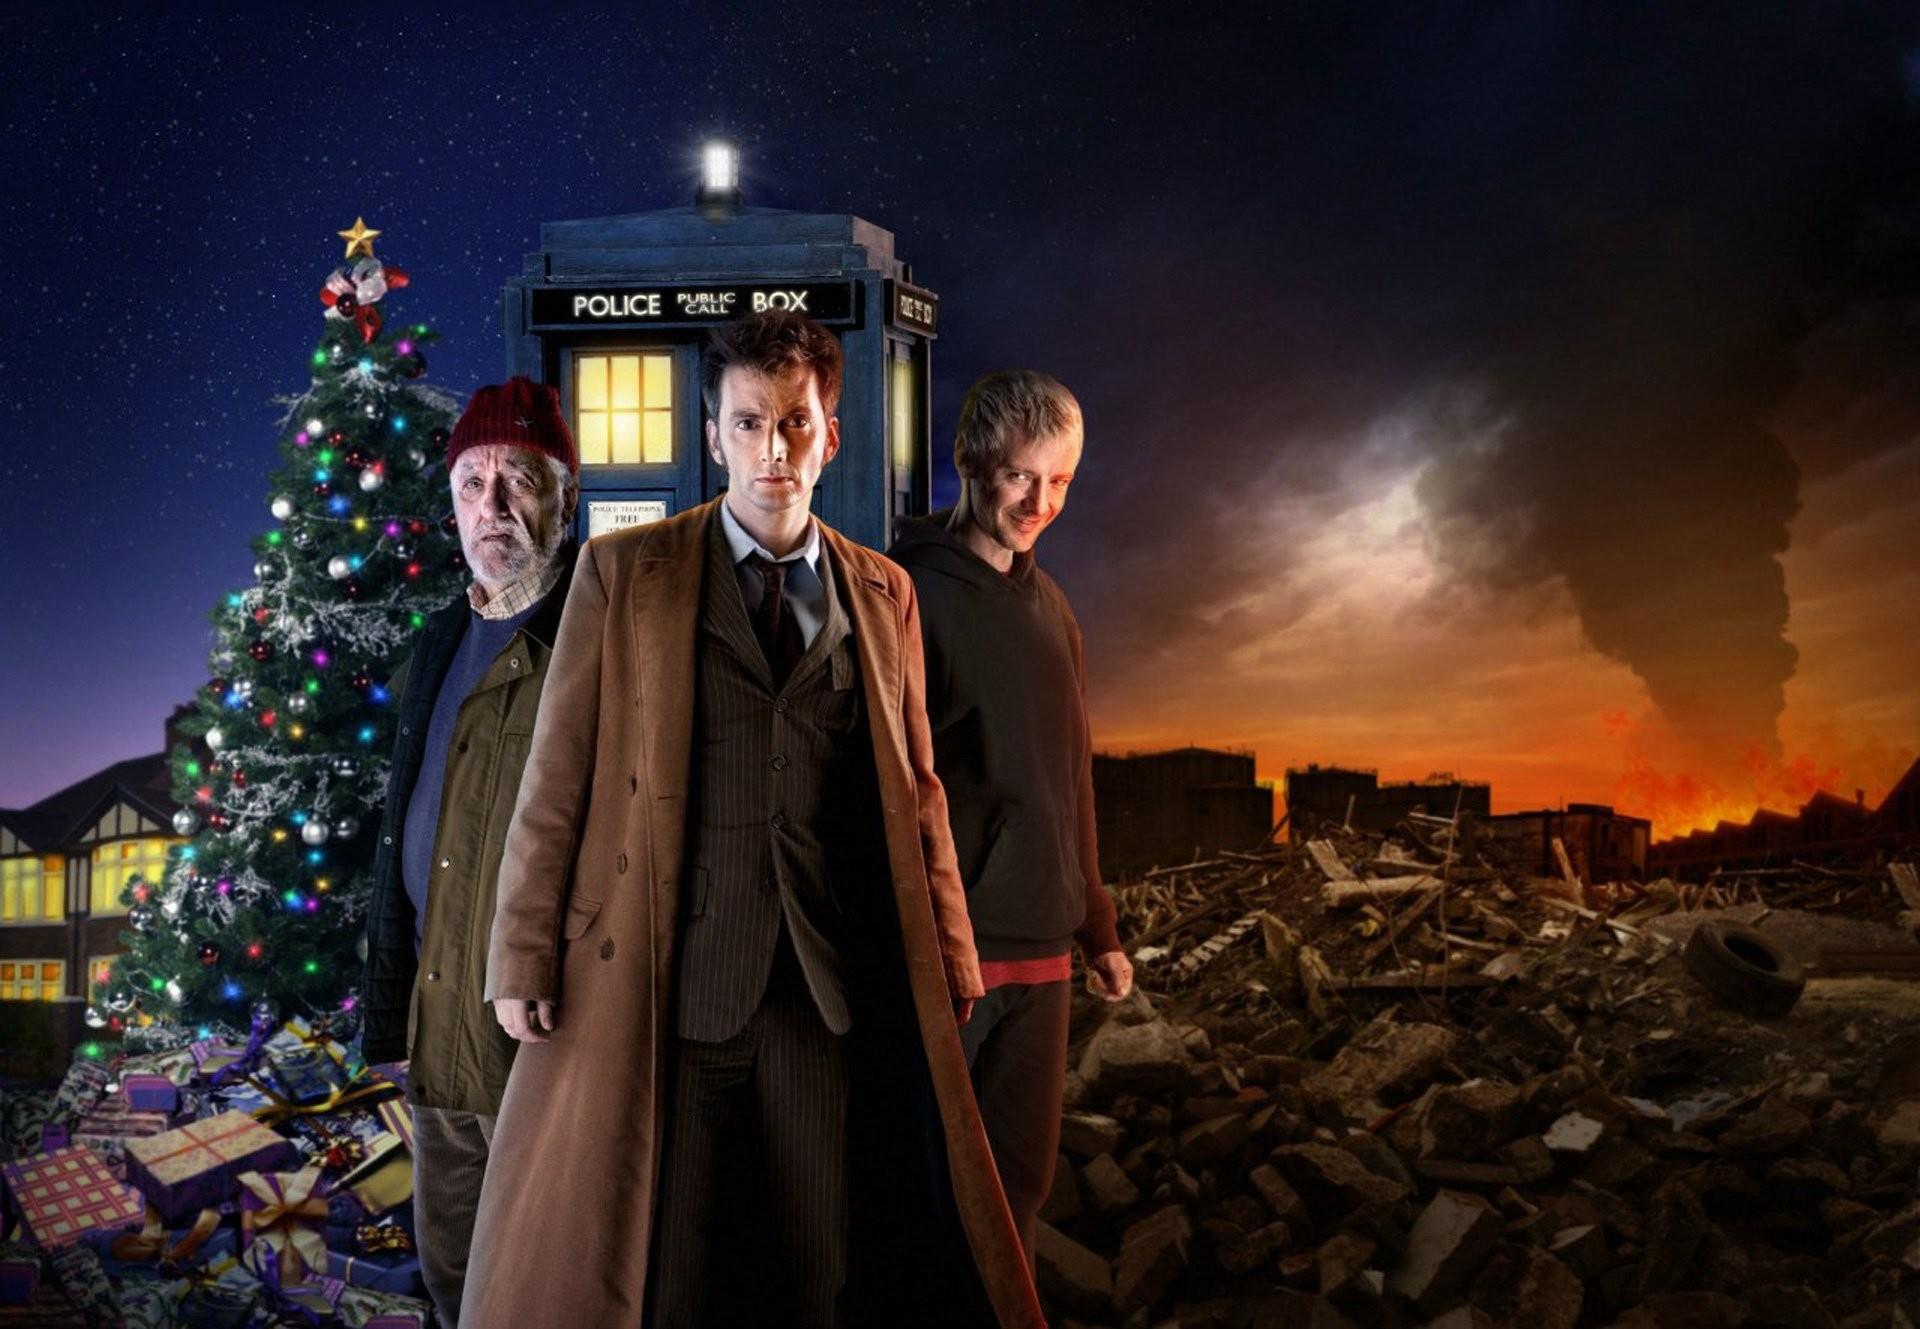 doctor who doctor who david tennant david tennant tenth doctor tenth doctor  john simm john simm